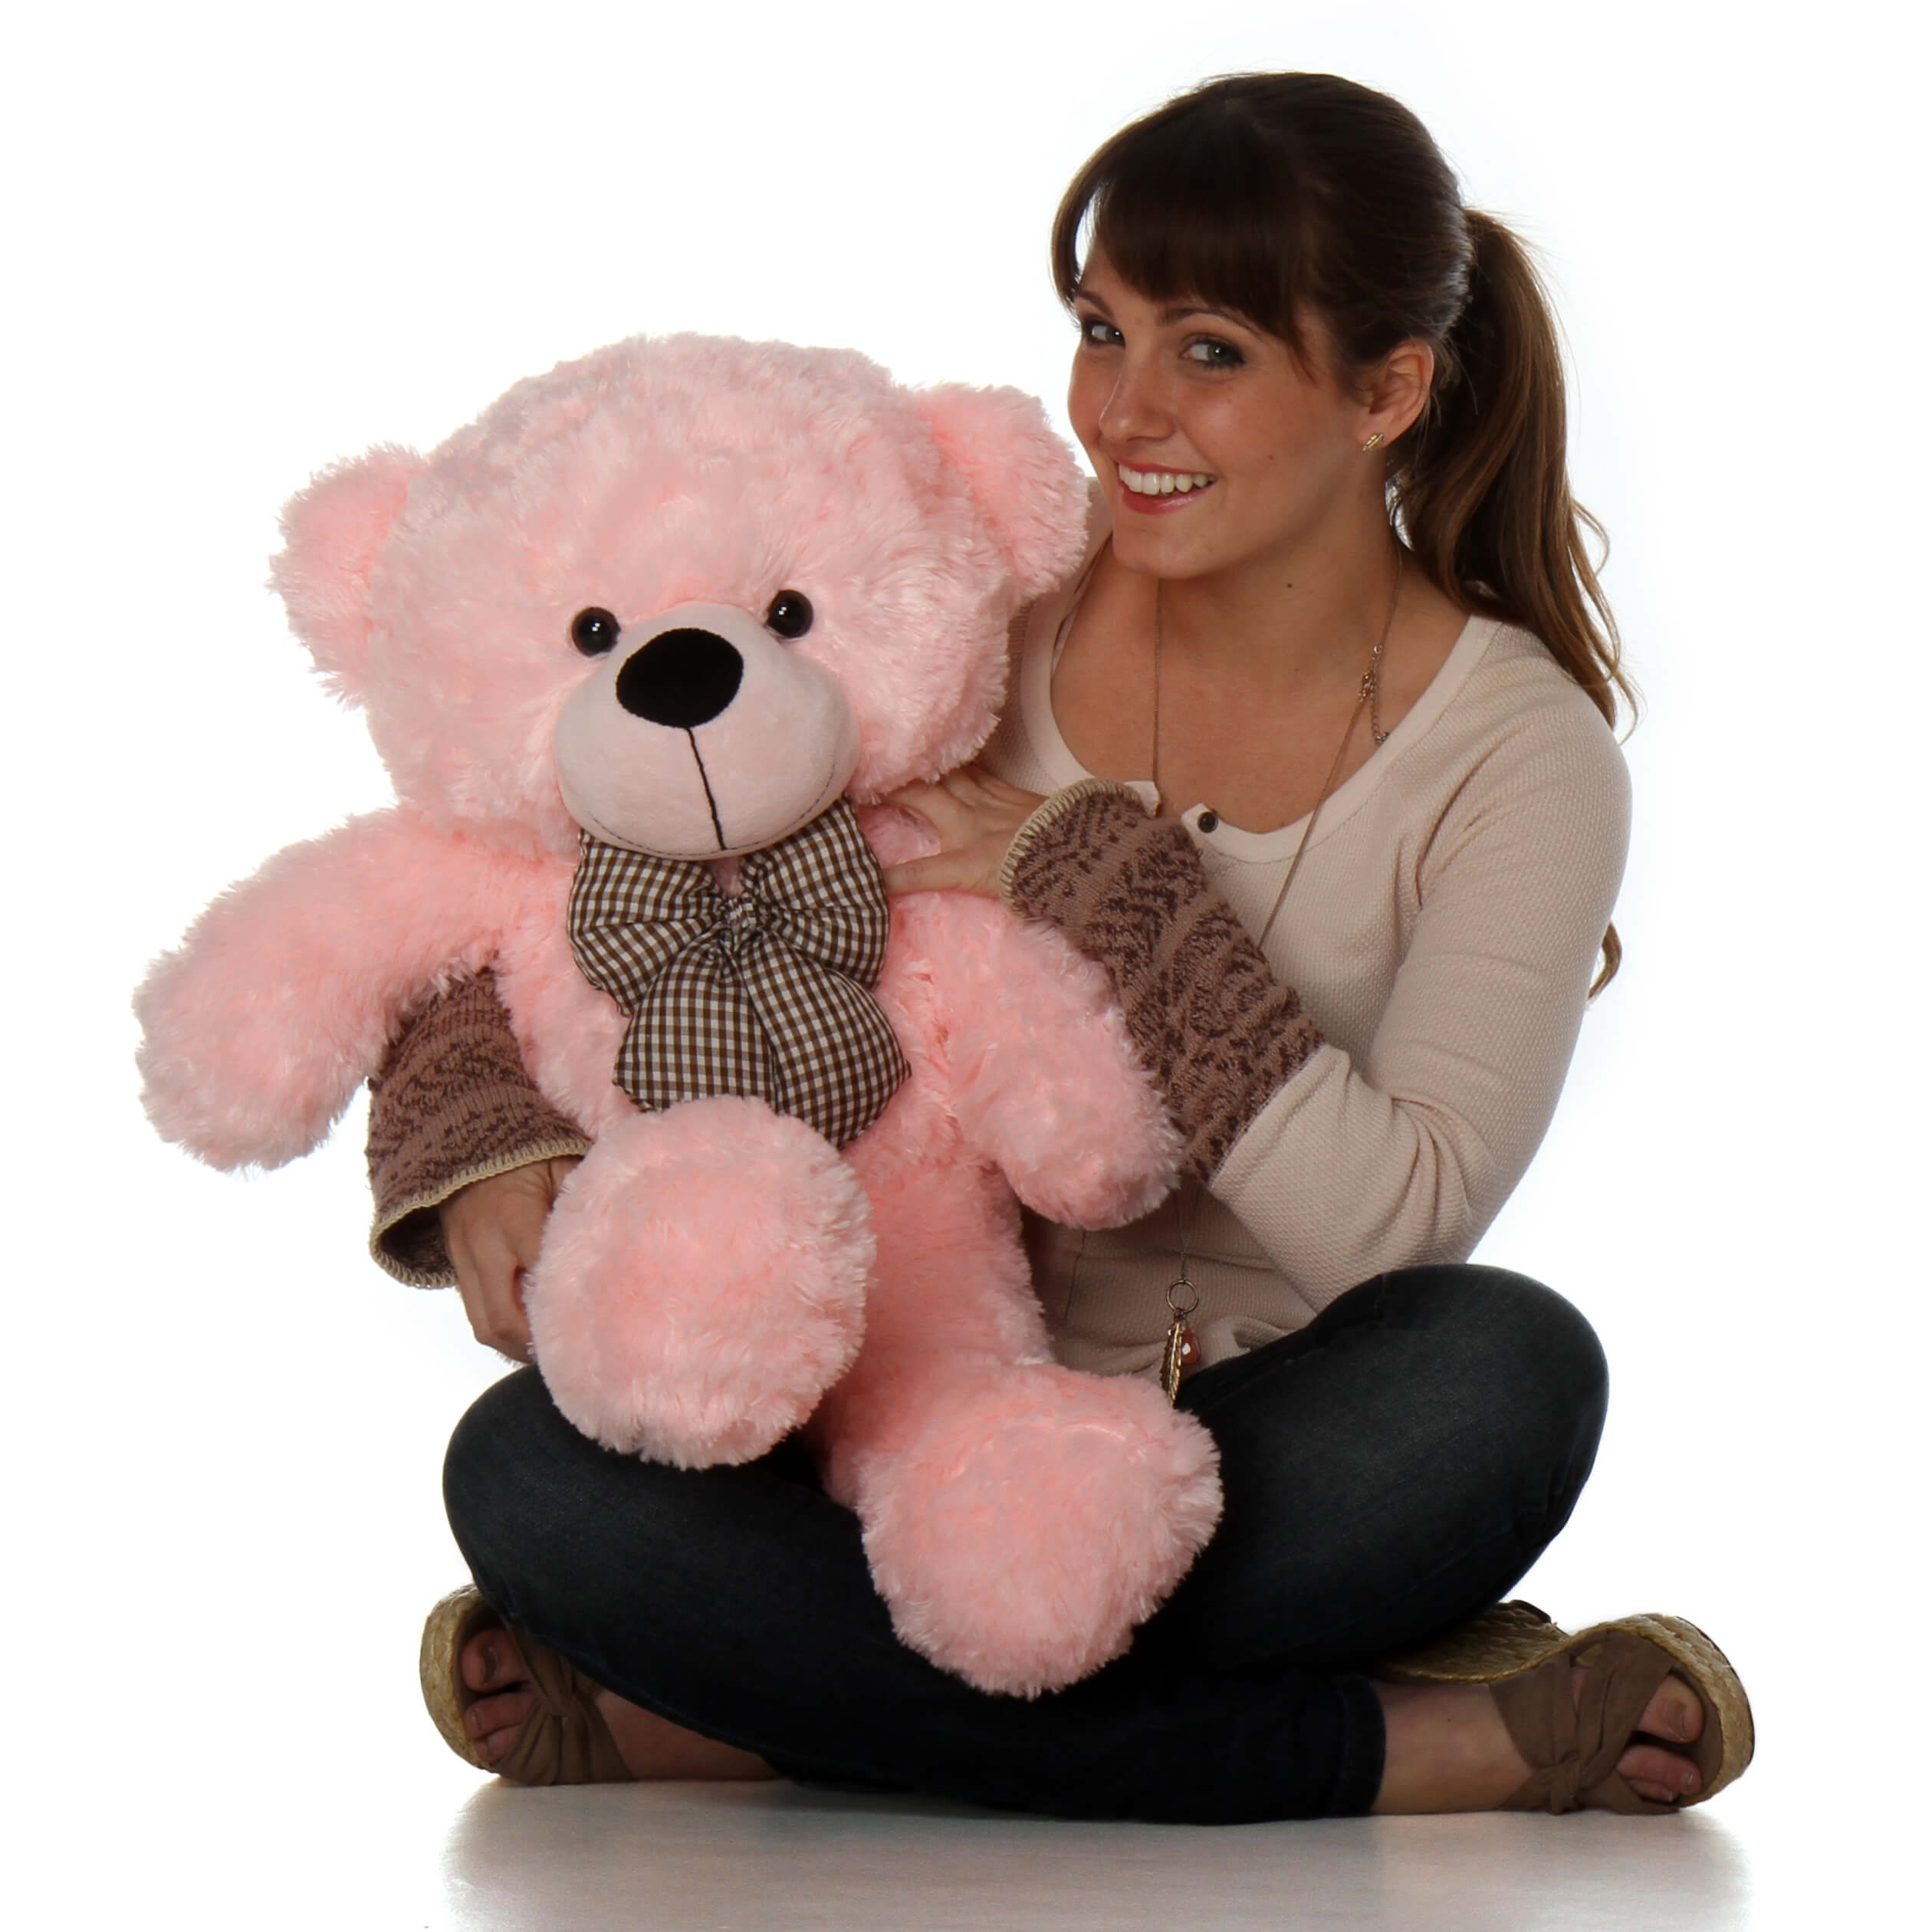 30in-lady-cuddles-soft-and-huggable-pink-teddy-bear.jpg